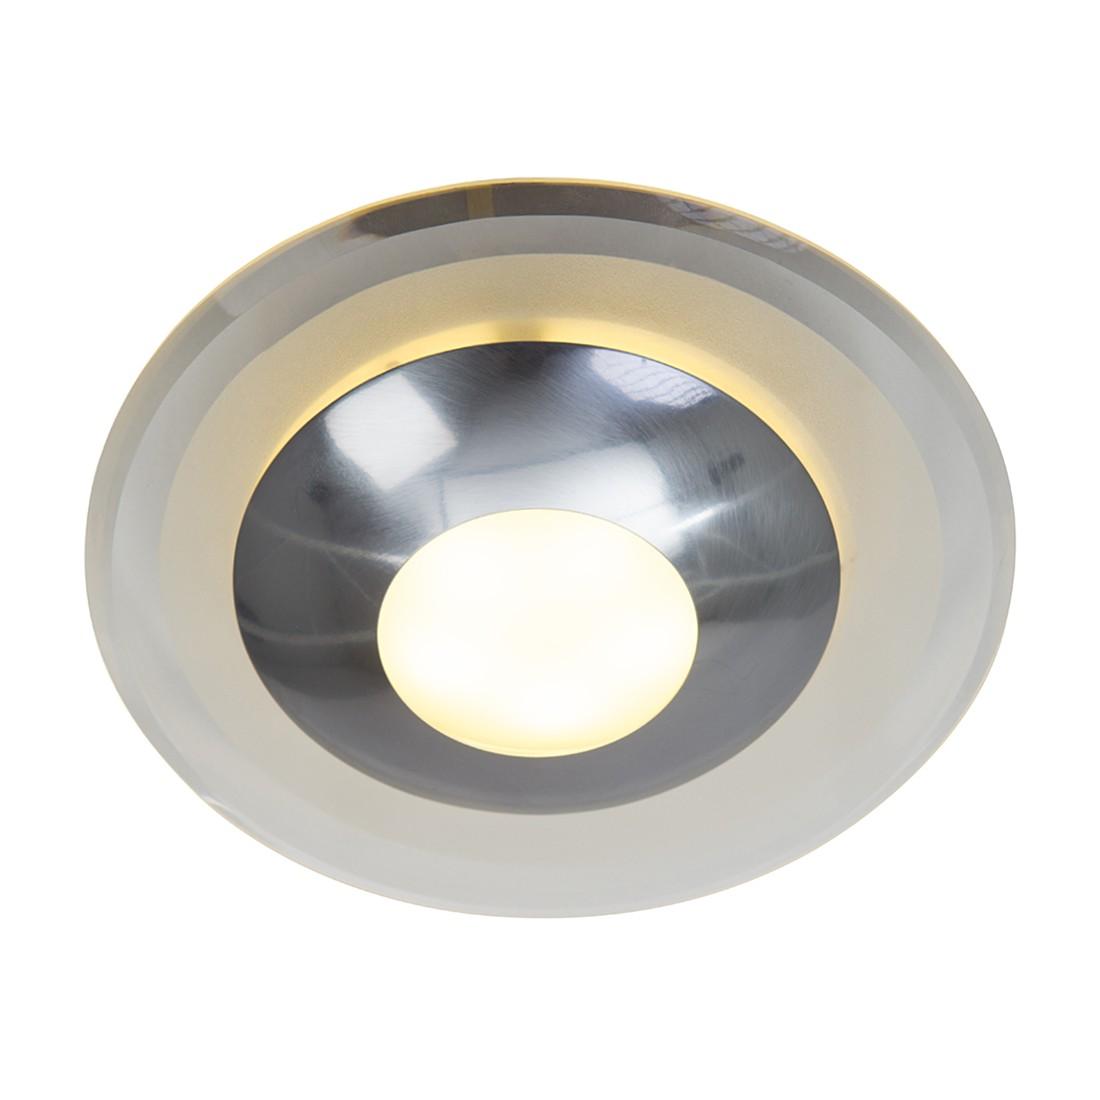 LED-Deckenleuchte Zelena 1-flammig ● Nickel matt- Steinhauer A+